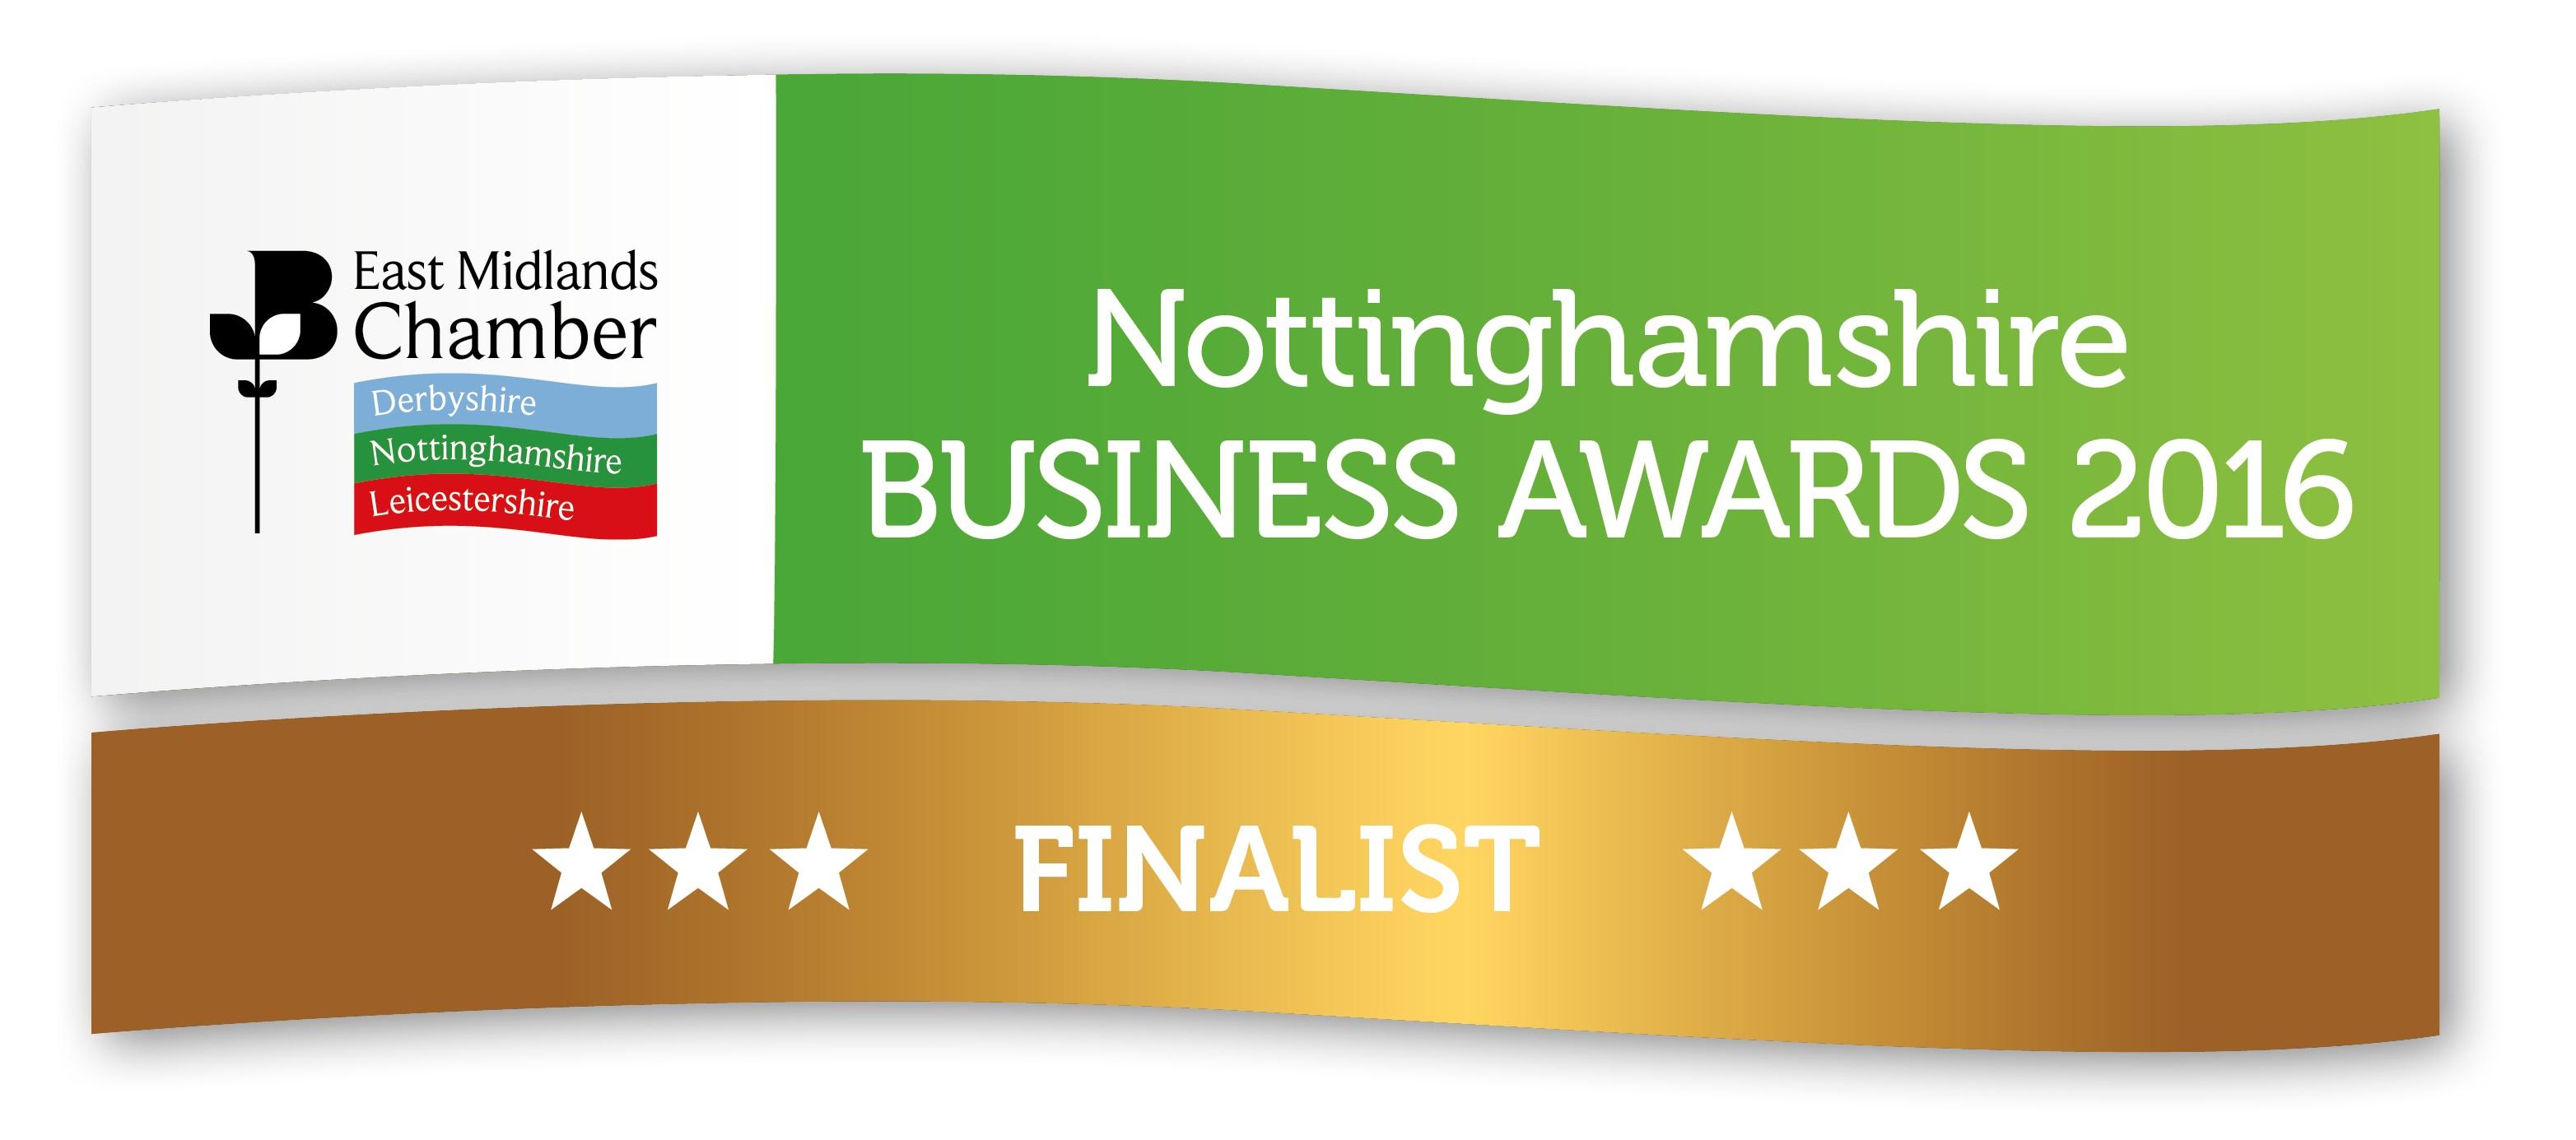 EMC Business Awards 2016 Finalist Logos - Notts